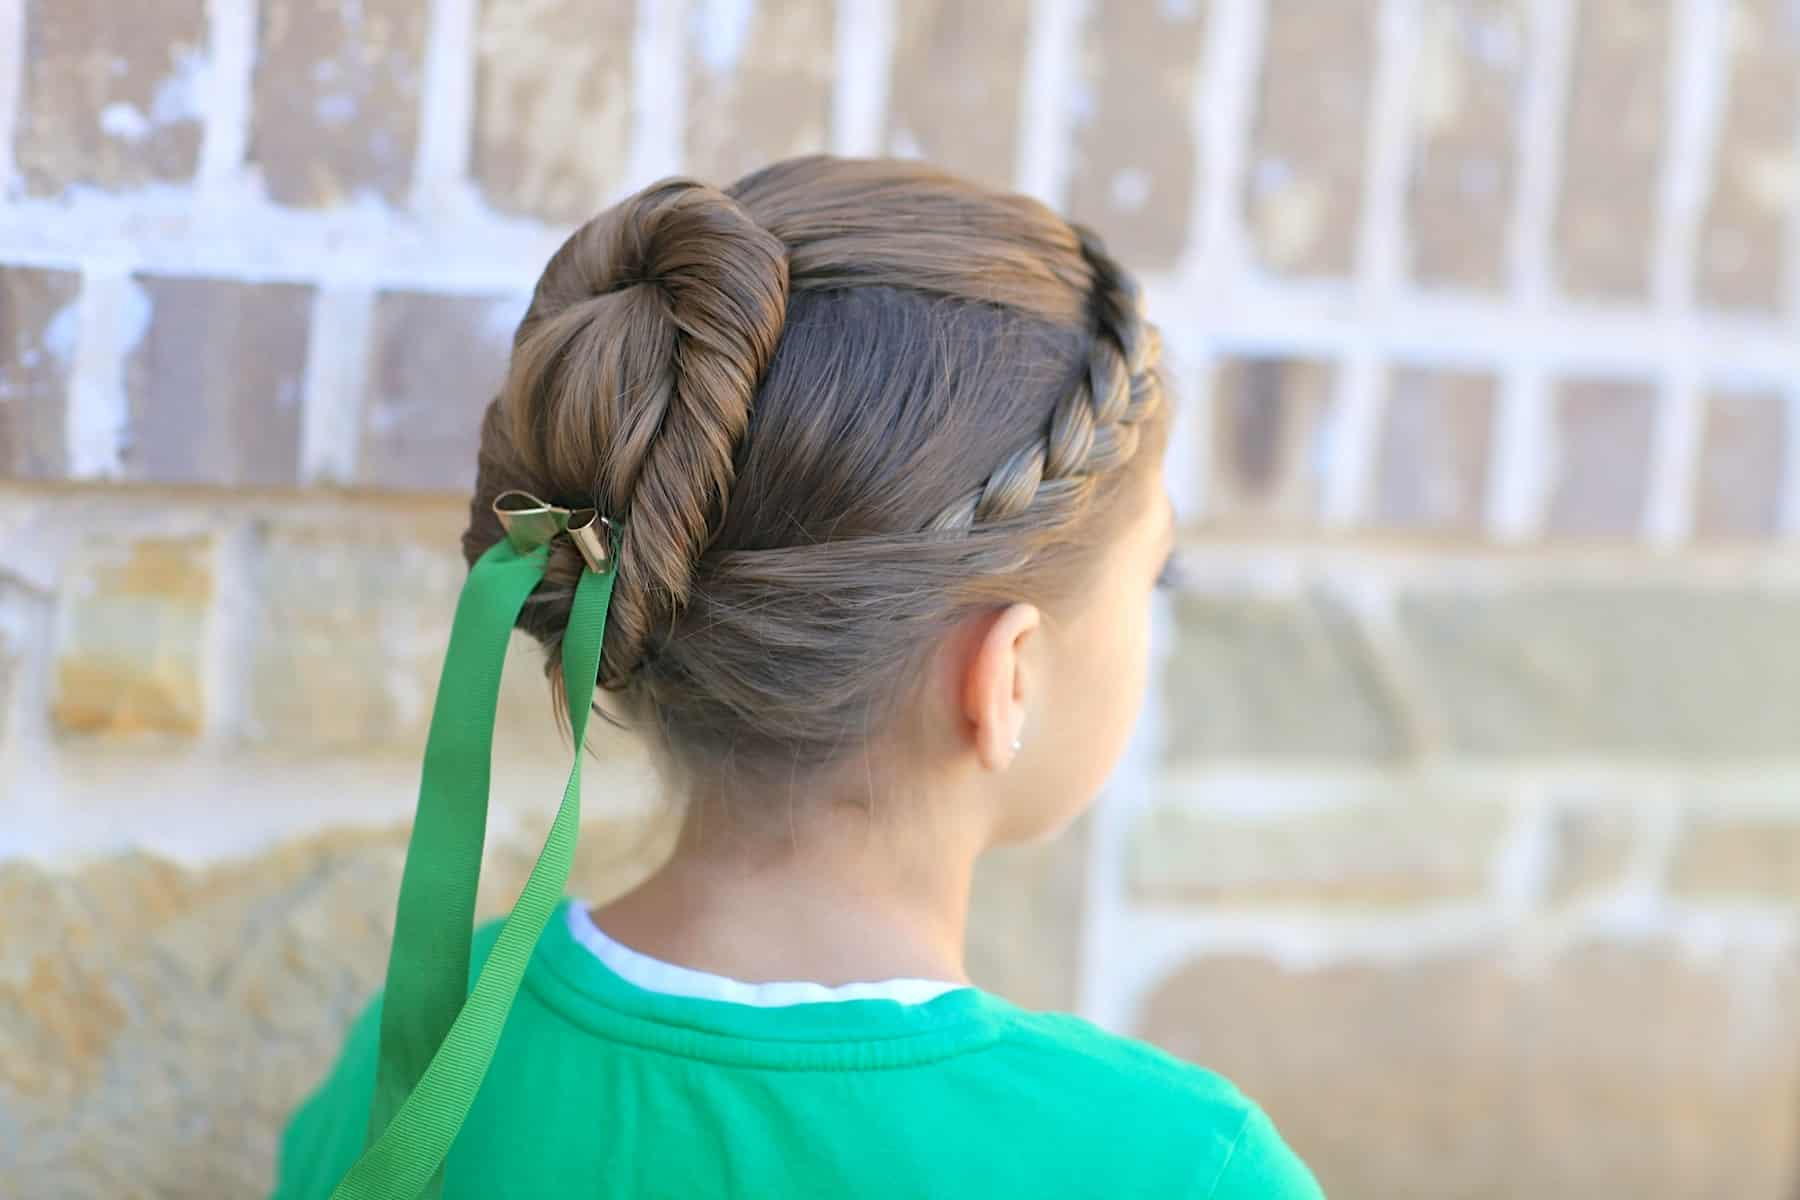 Princess coronotaion style hair tutorial